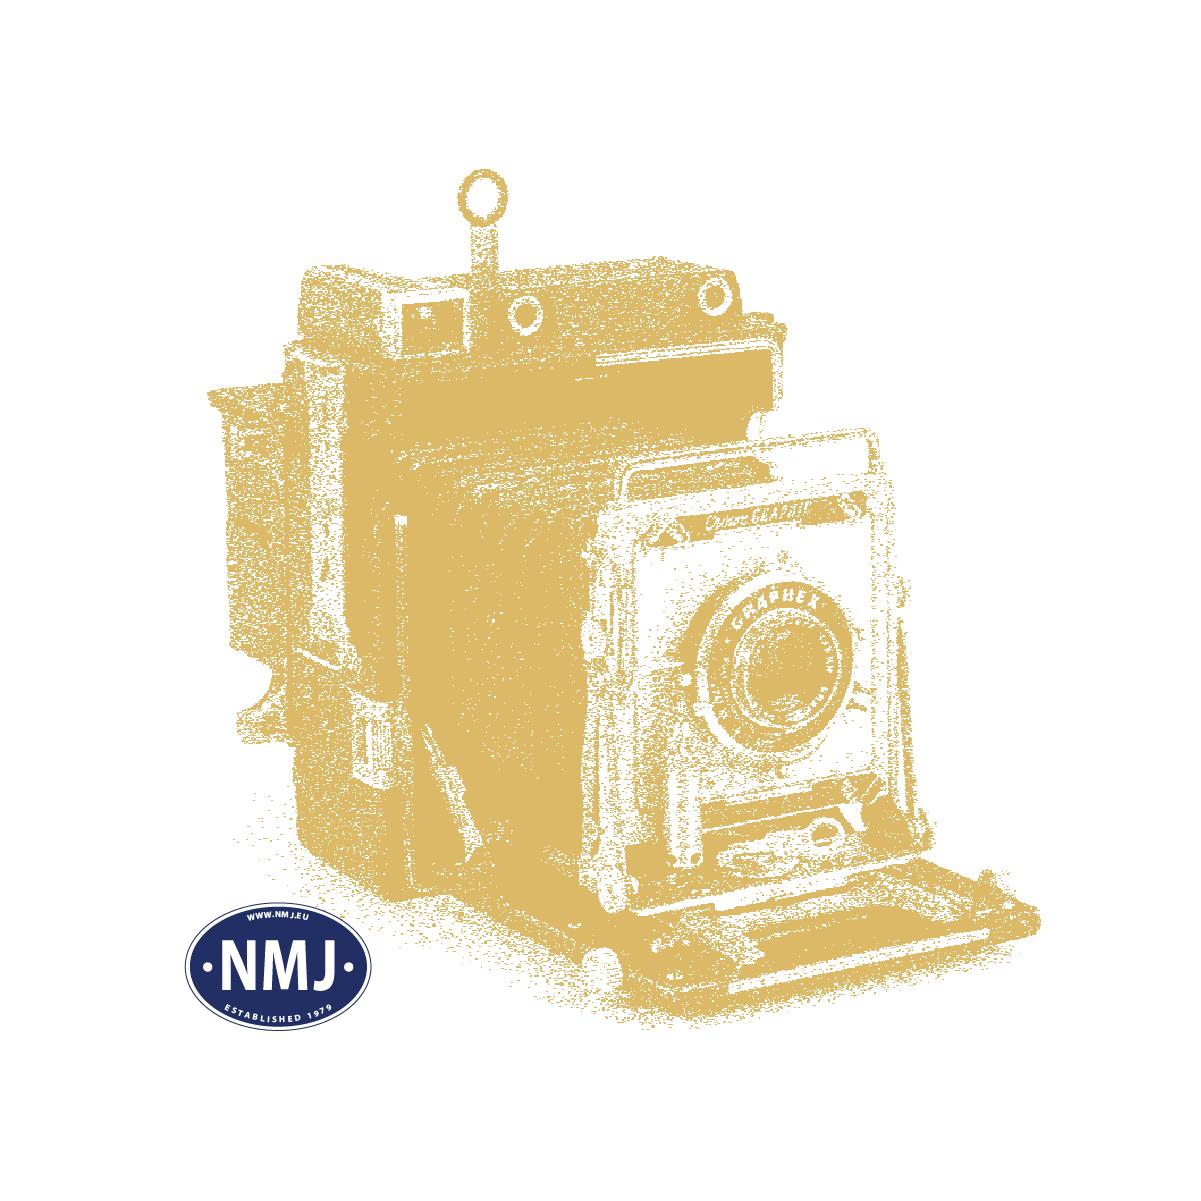 NMJT93102 - NMJ Topline NSB El14 2182, Gammeldesign, DC